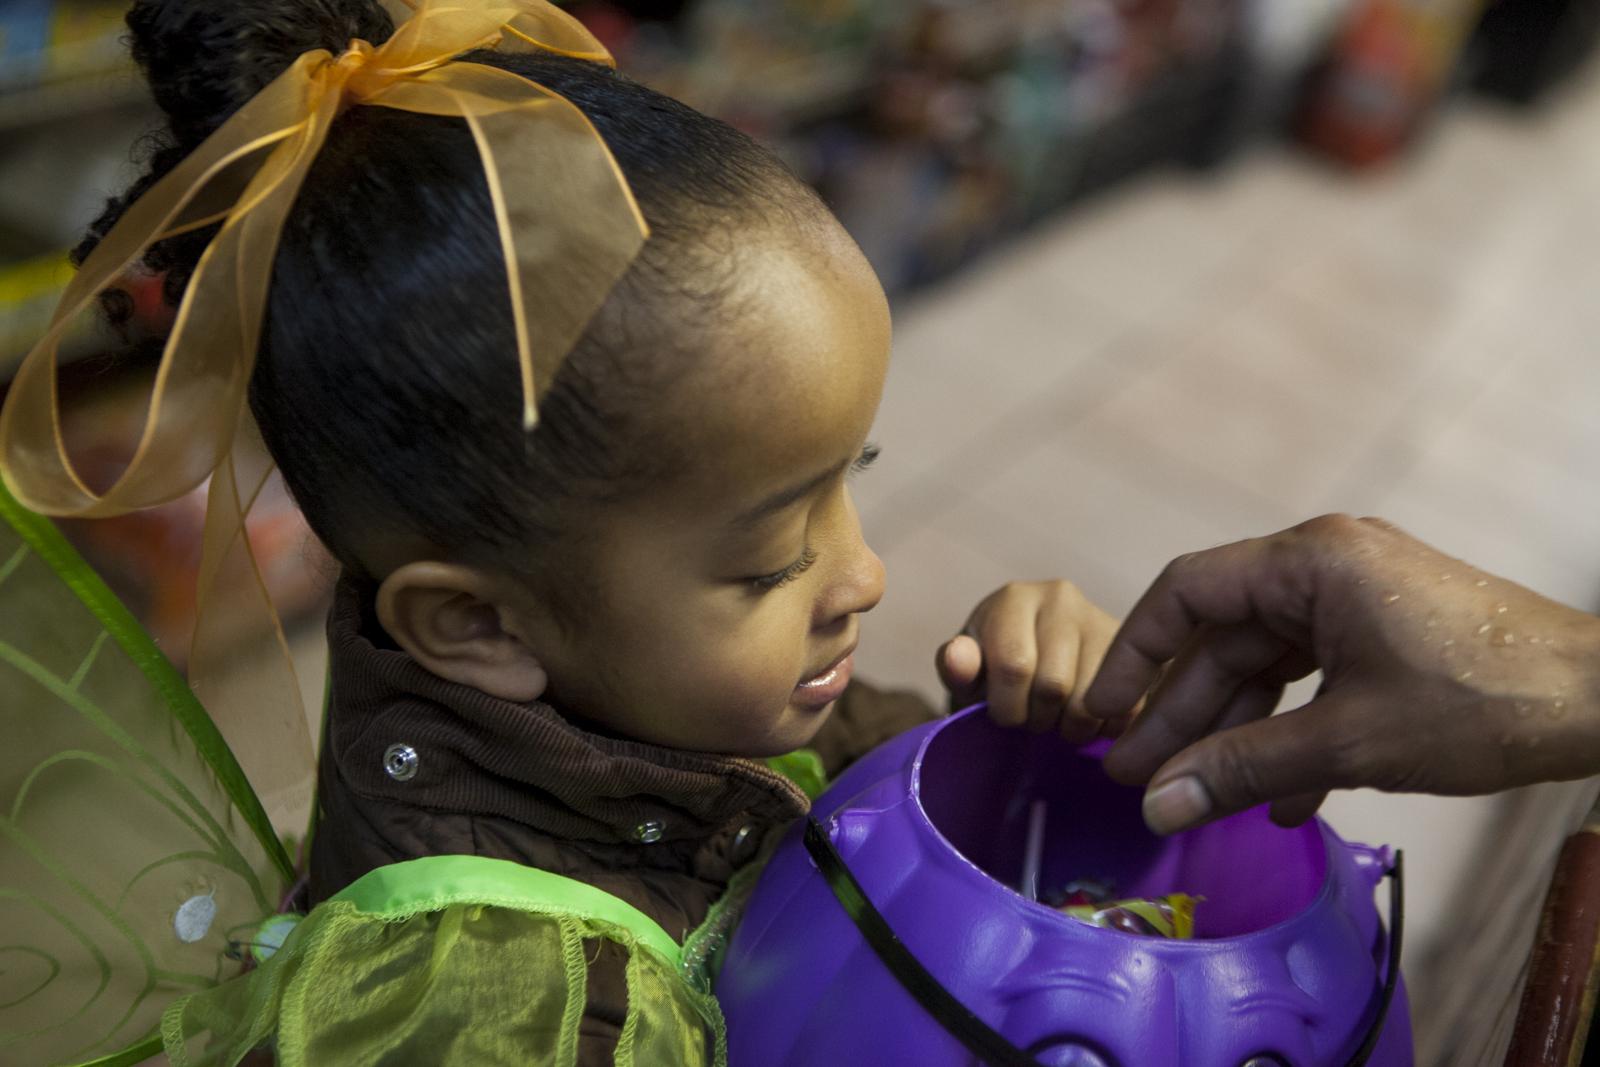 A clerk drops candy into her purple pumpkin head bucket.